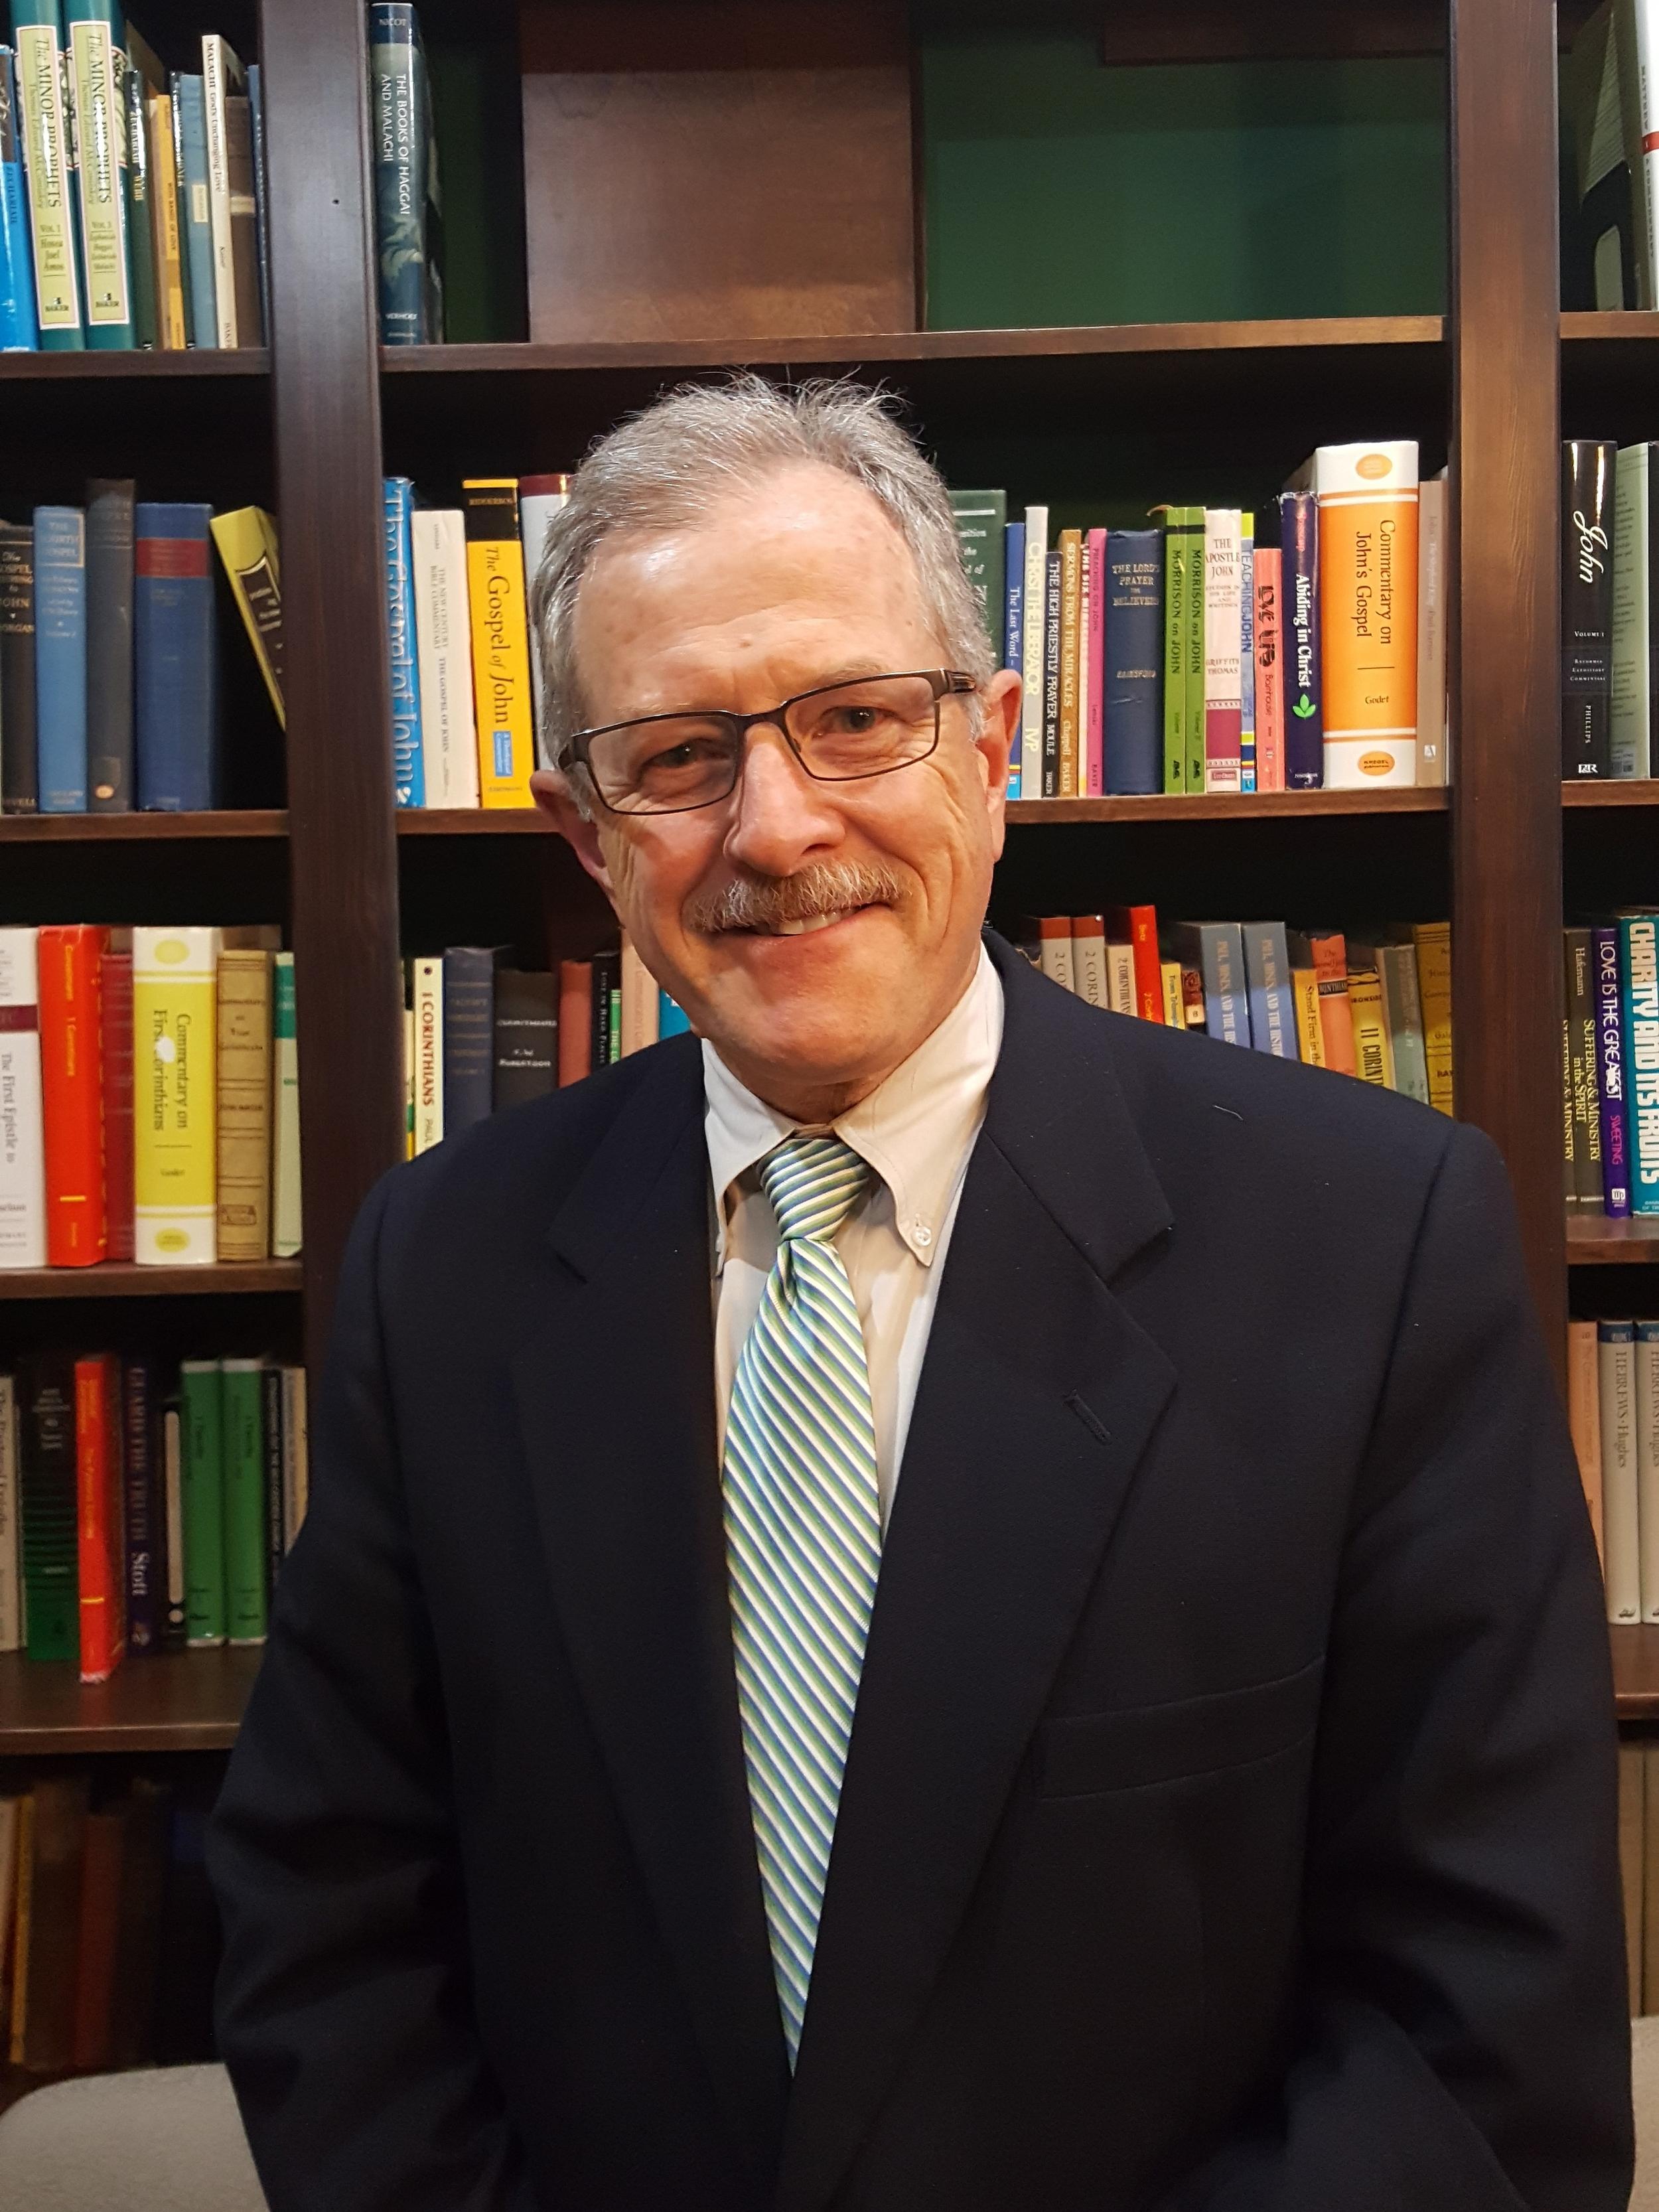 Jim Rosenquist